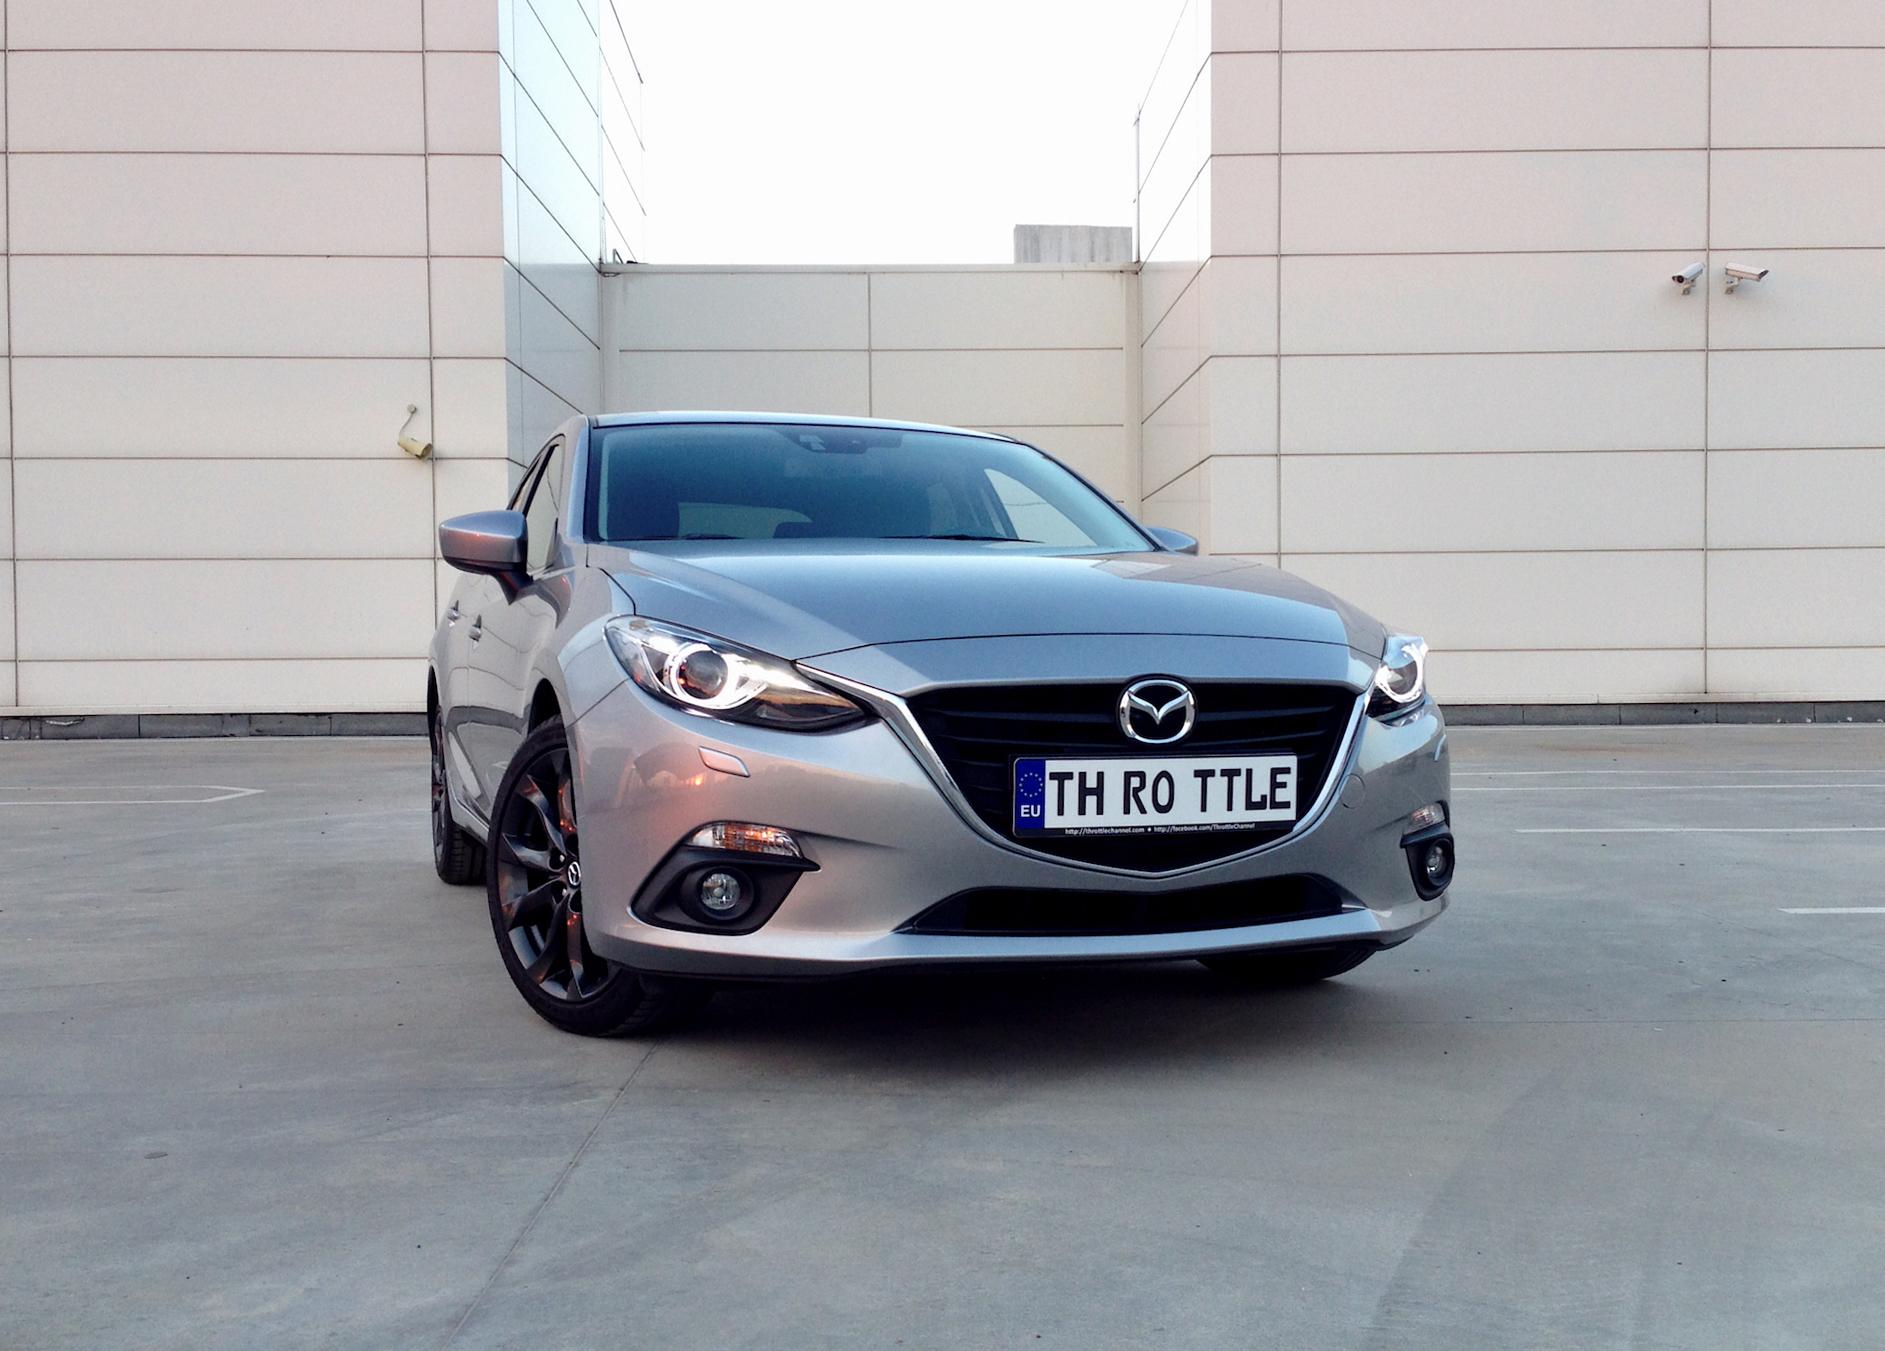 Kelebihan Kekurangan Mazda Skyactiv G Harga